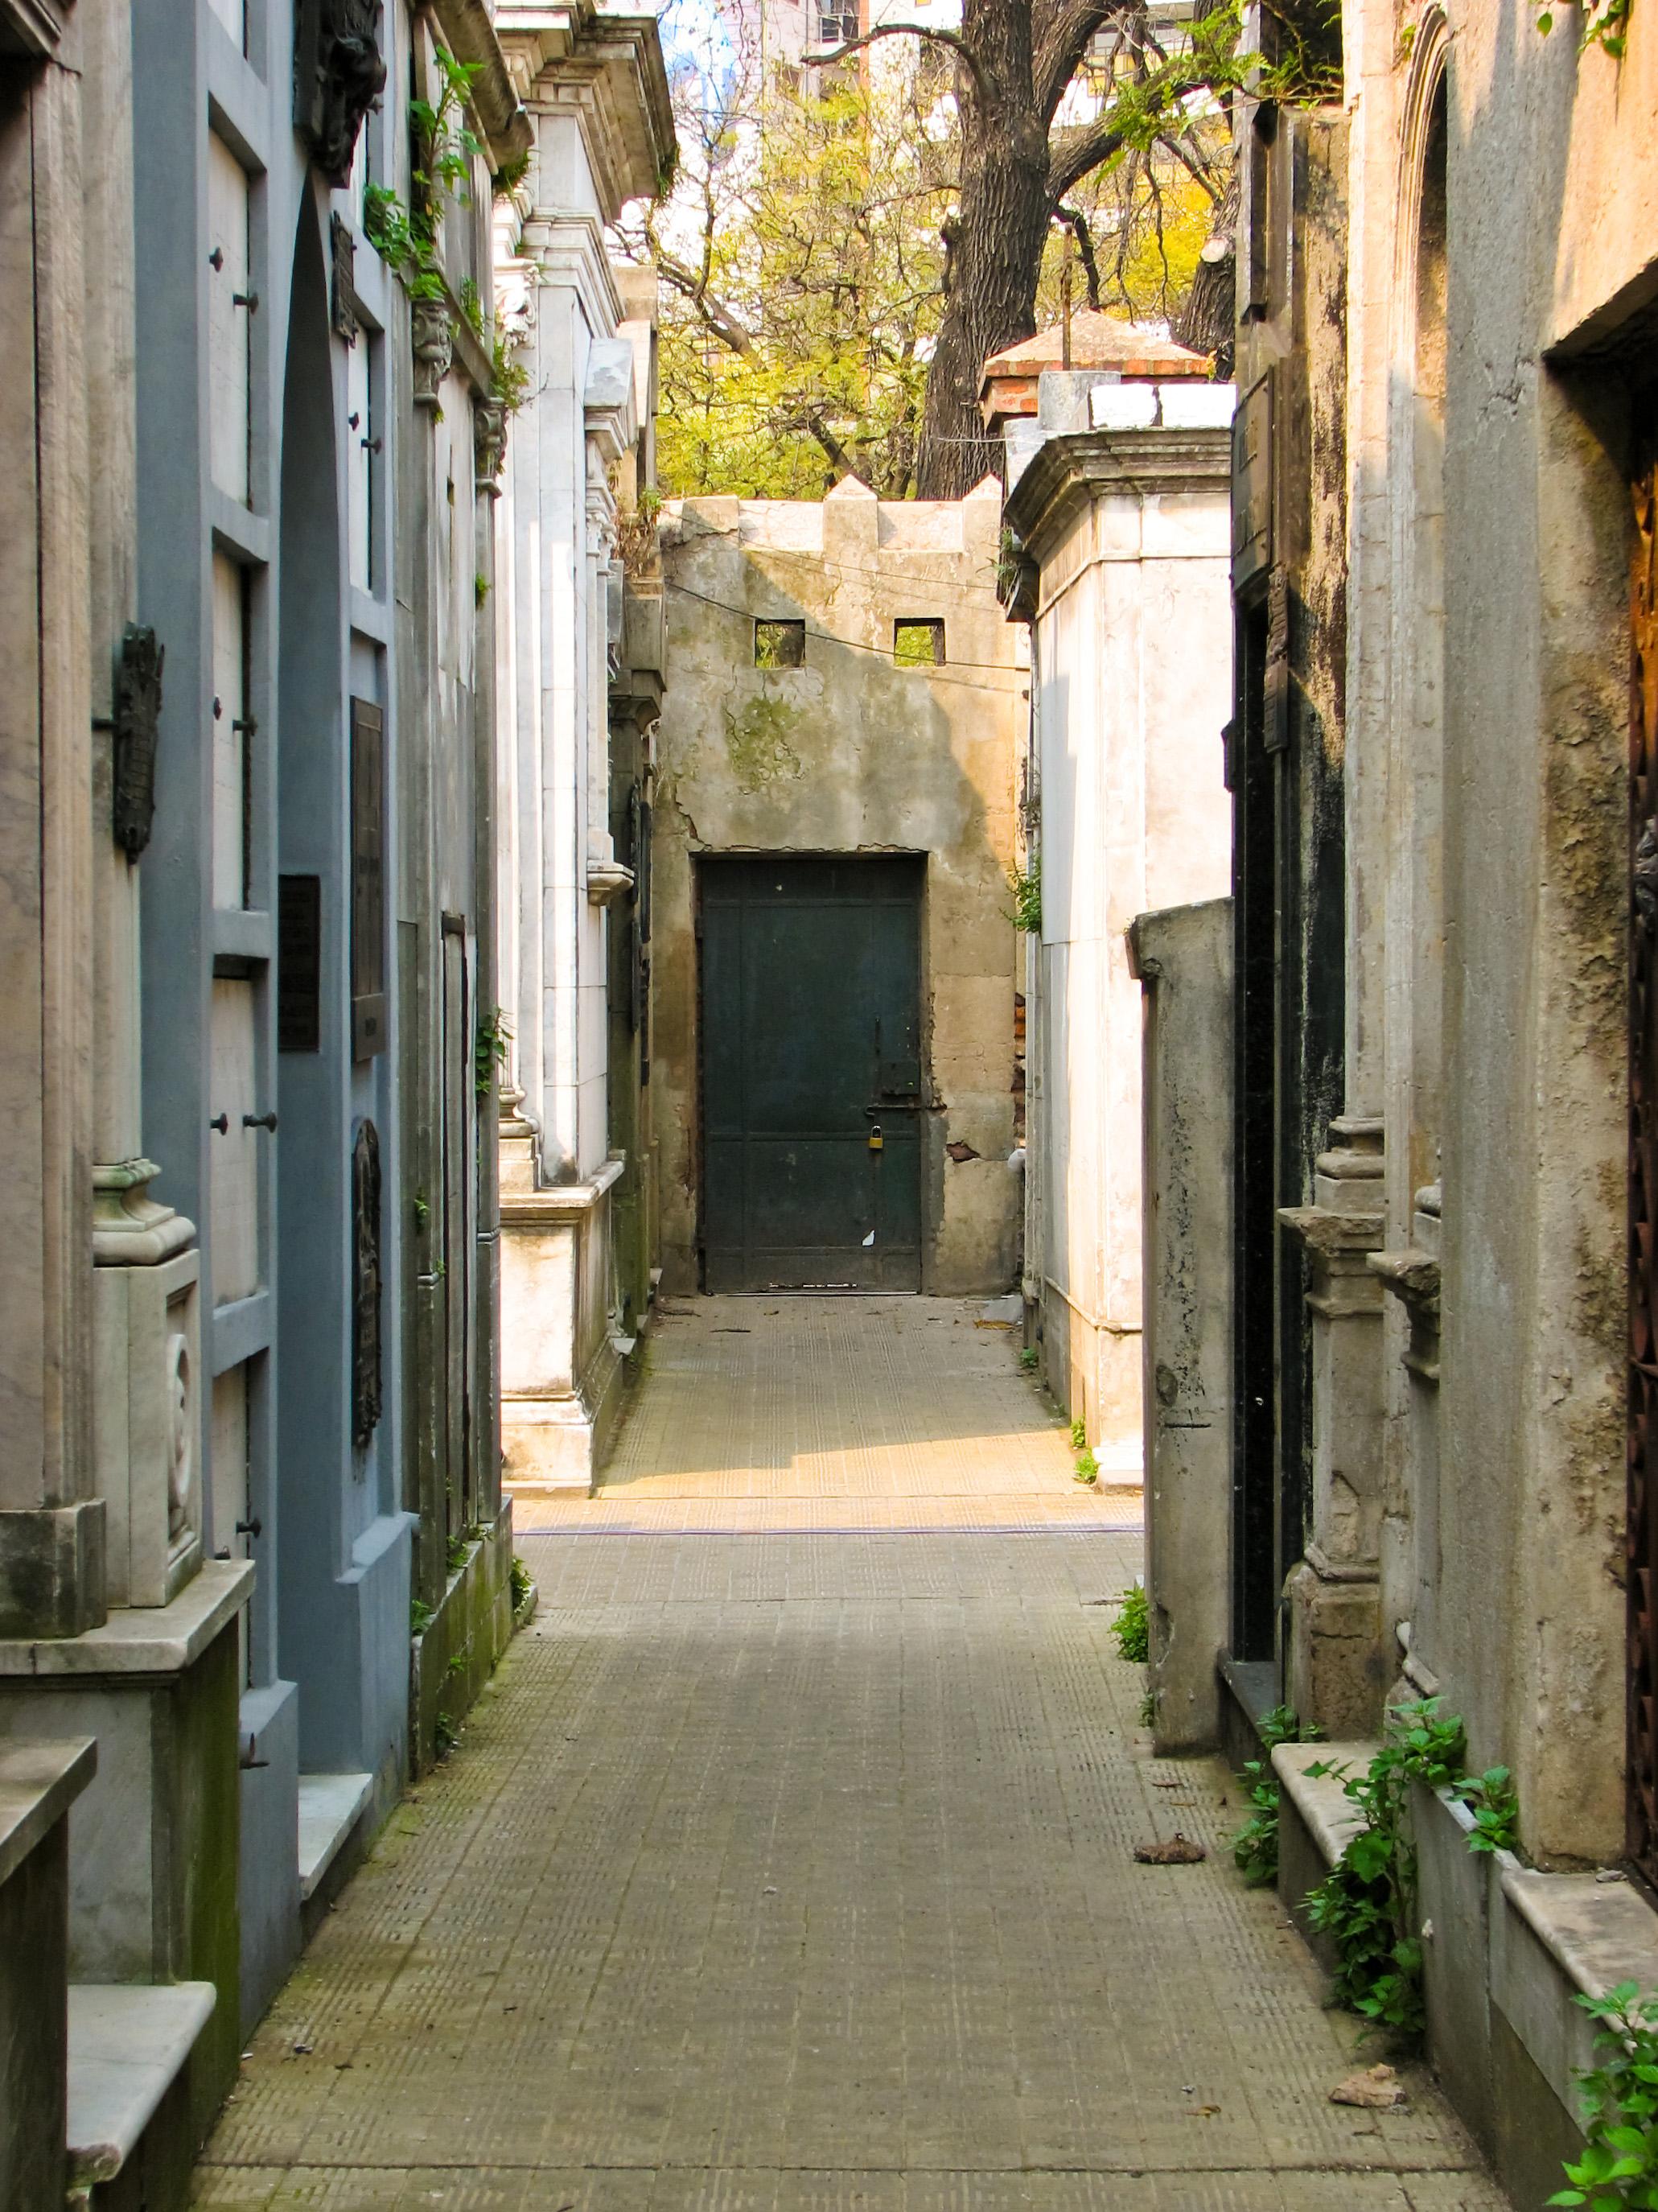 Cemetery scape, Burial, Gravestone, Tomb, Street, HQ Photo